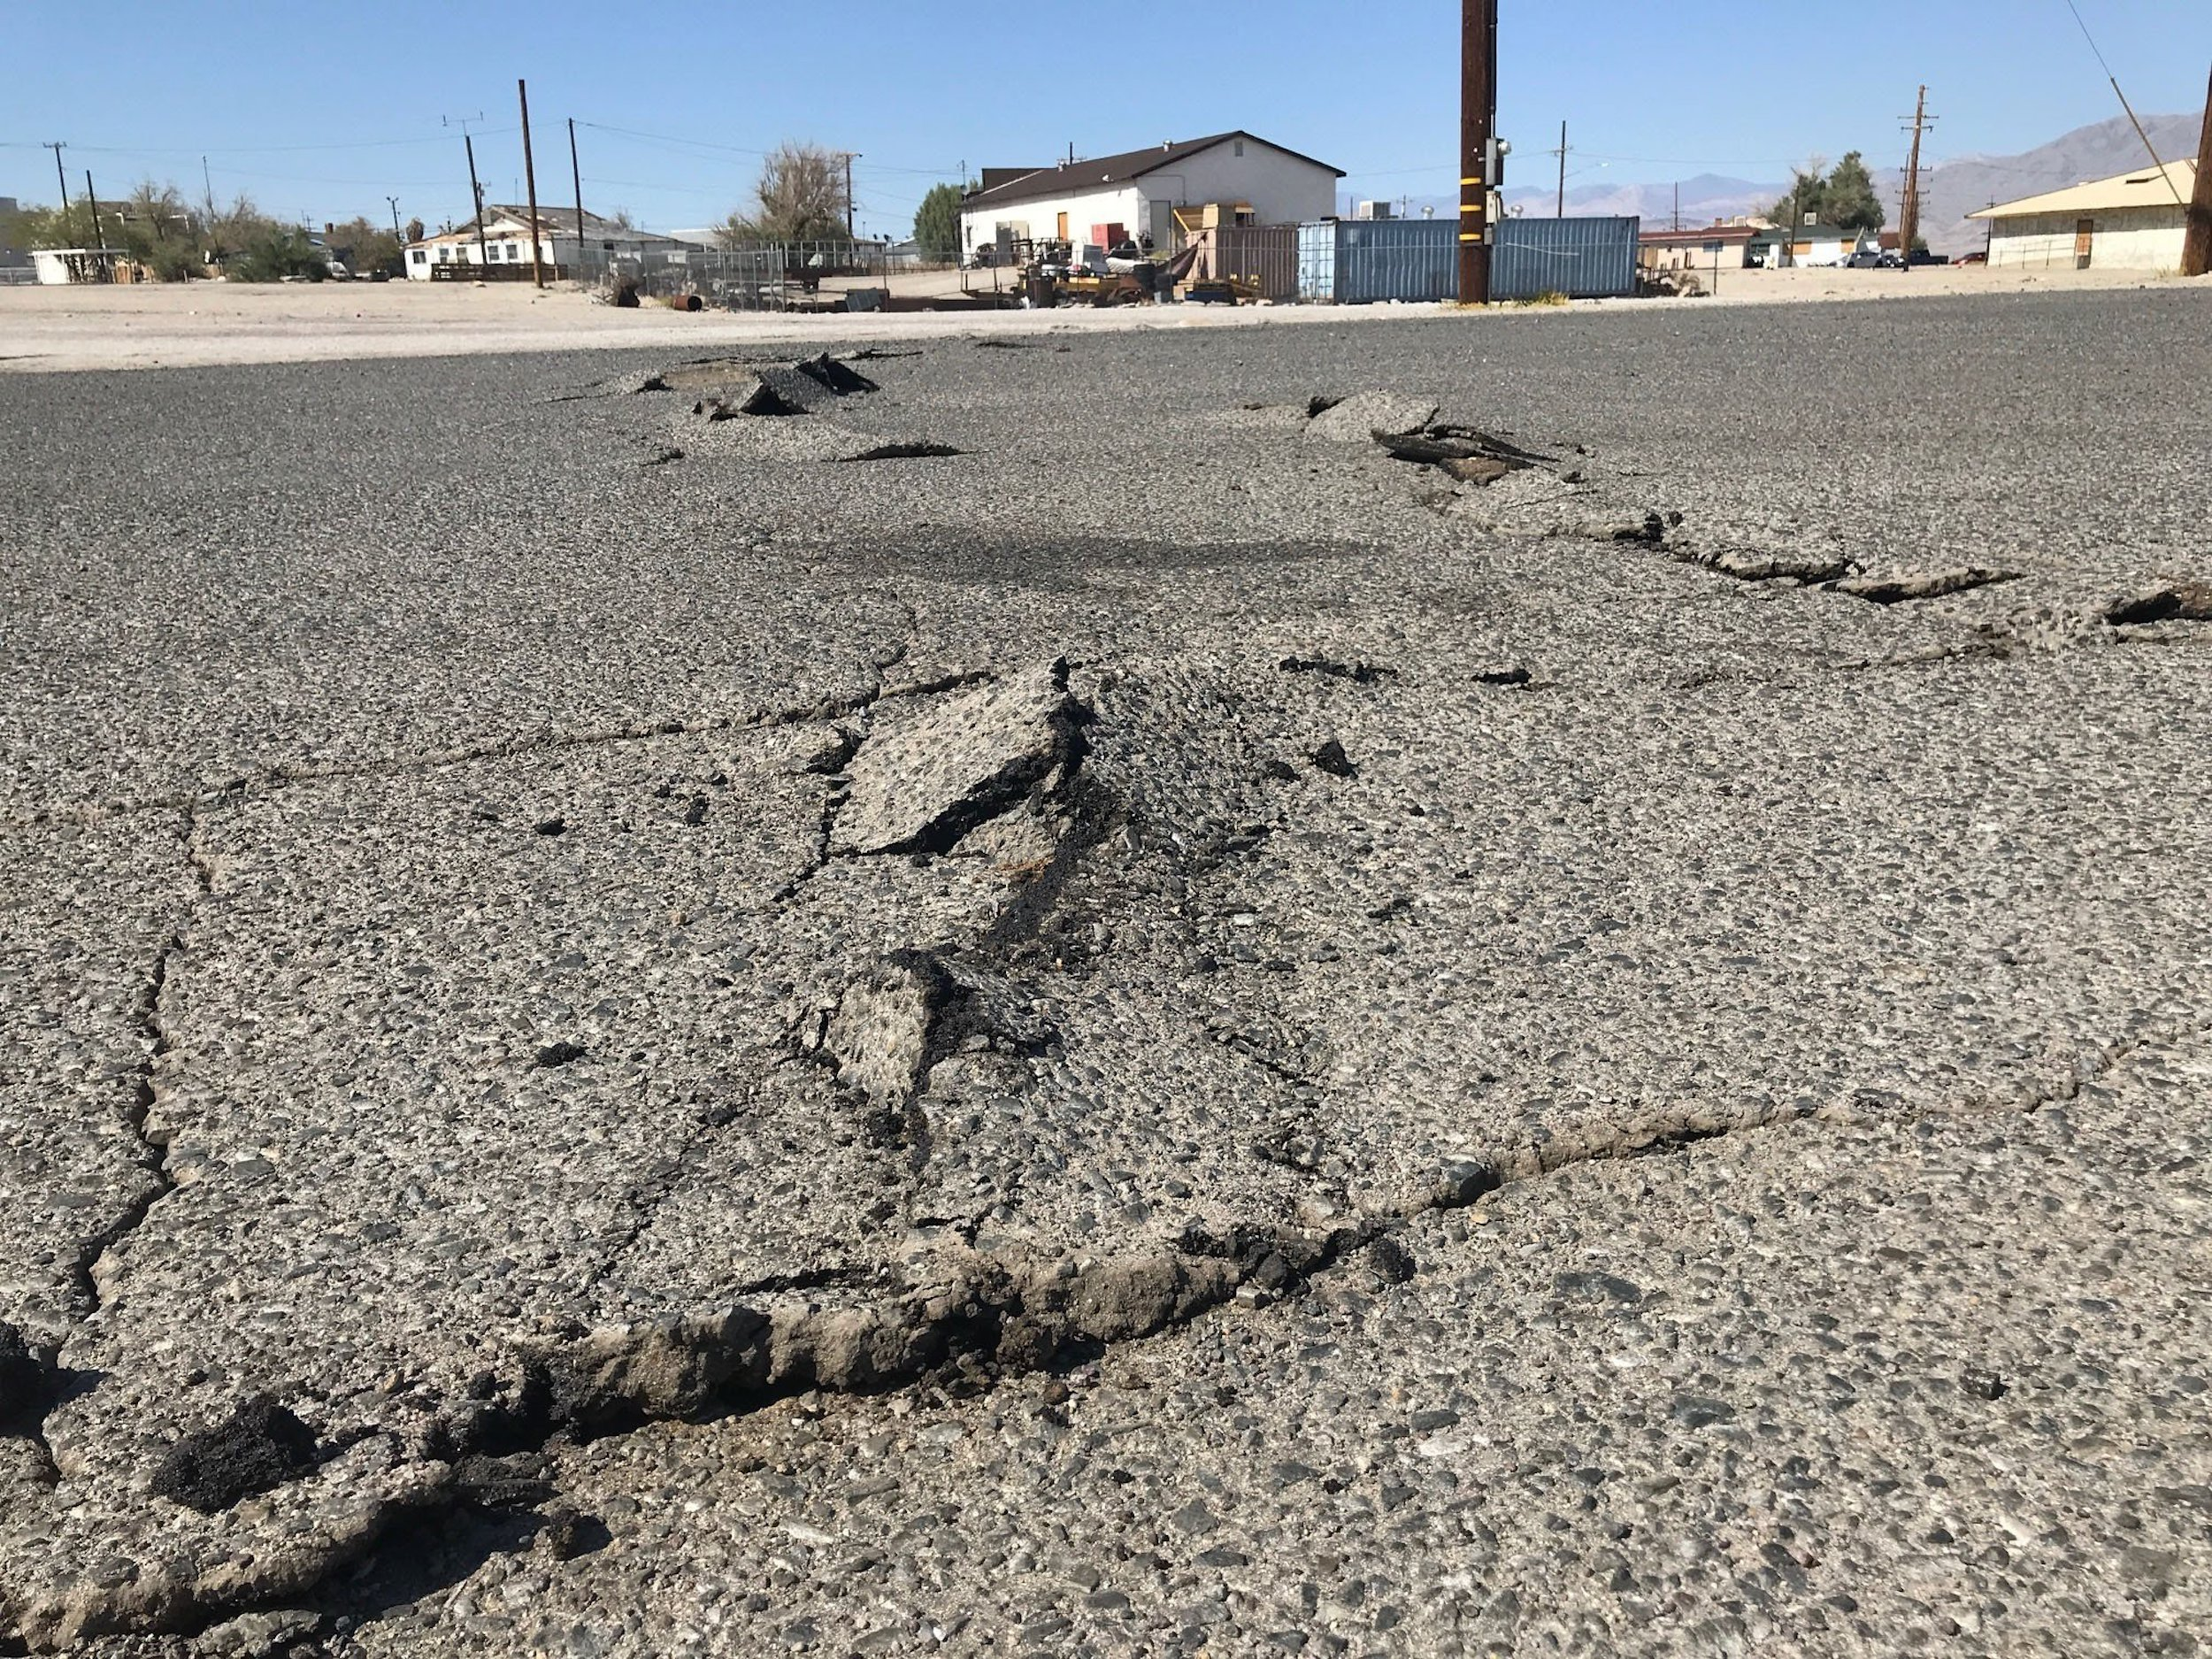 6 4 Magnitude Earthquake Shakes Southern California